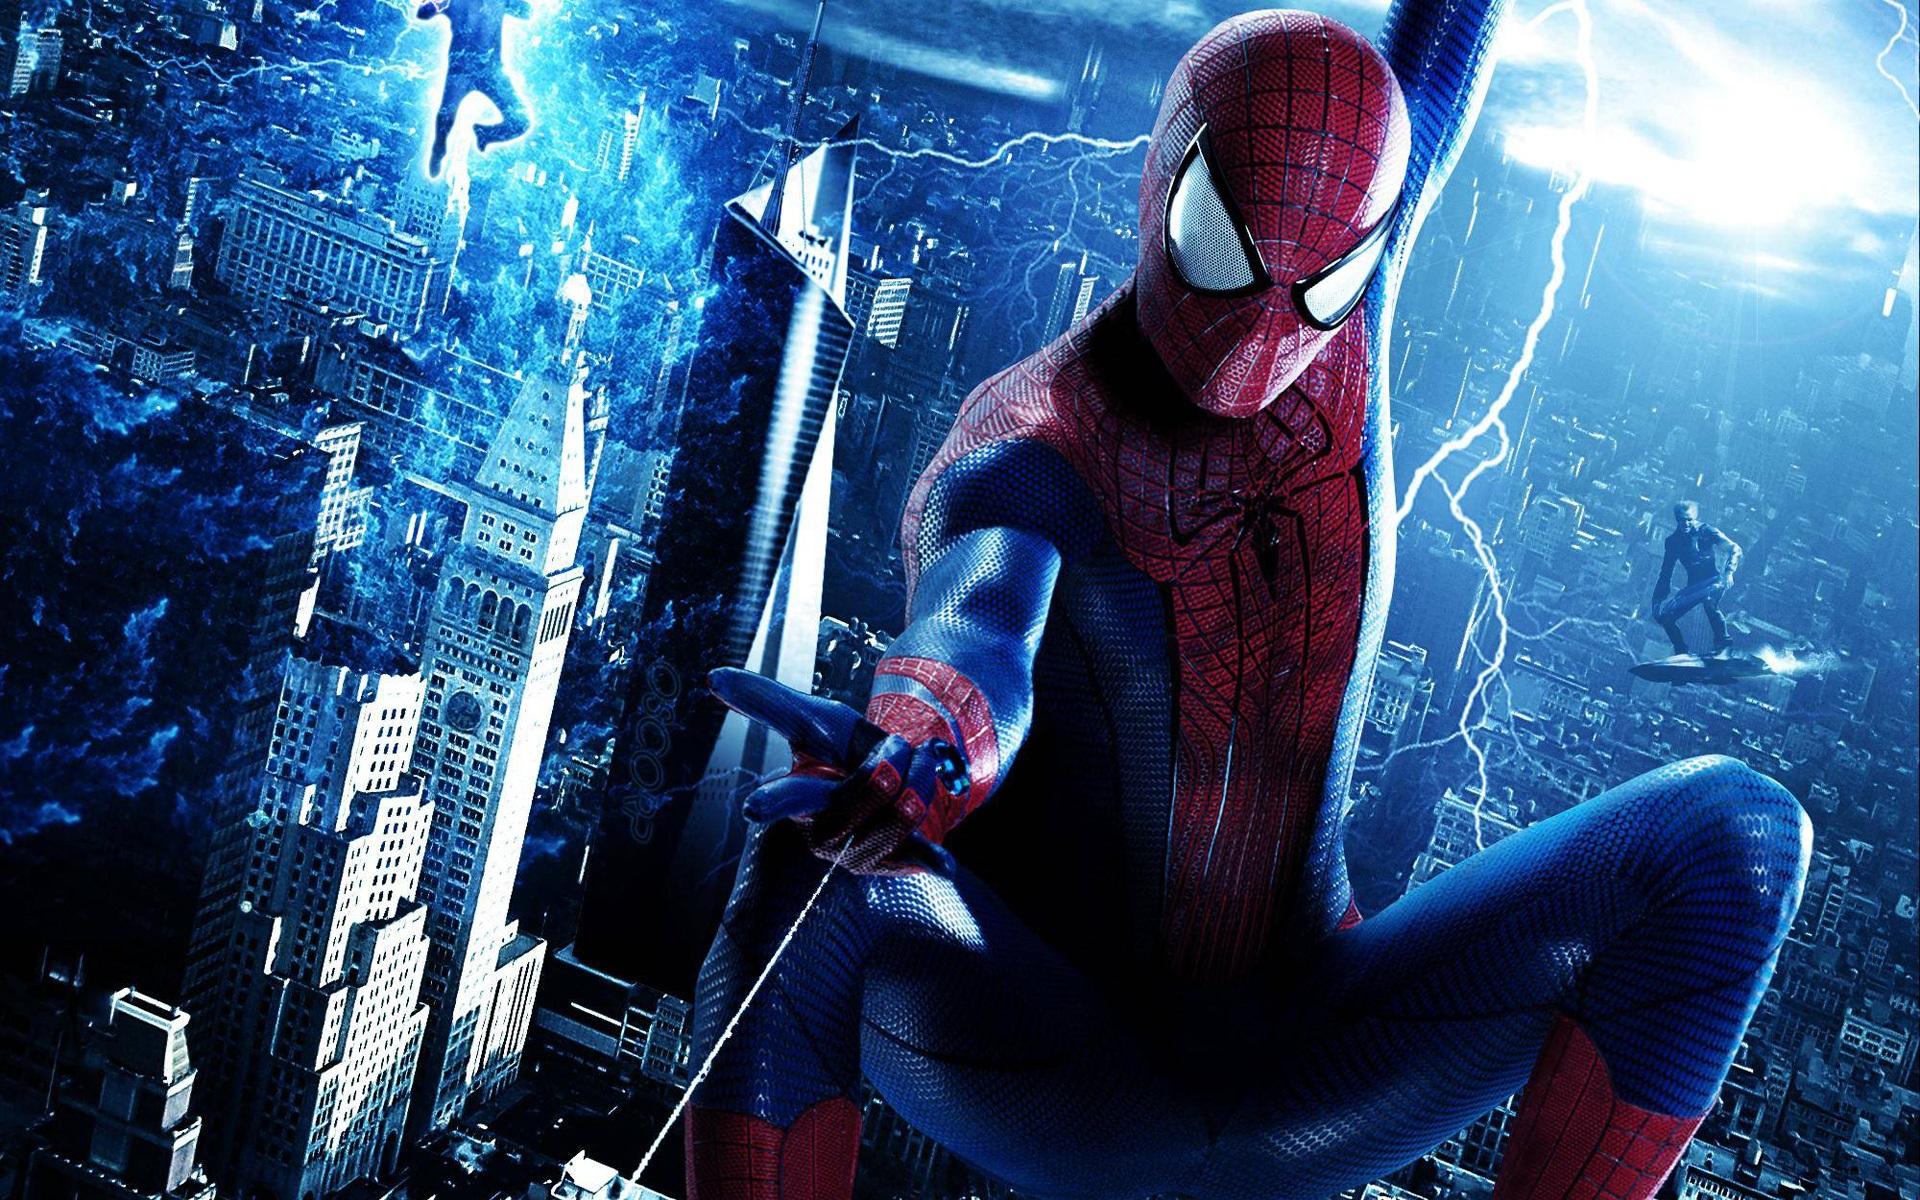 The amazing spider man 2 hd fondos de pantalla 1920x1200 for Fondos de spiderman